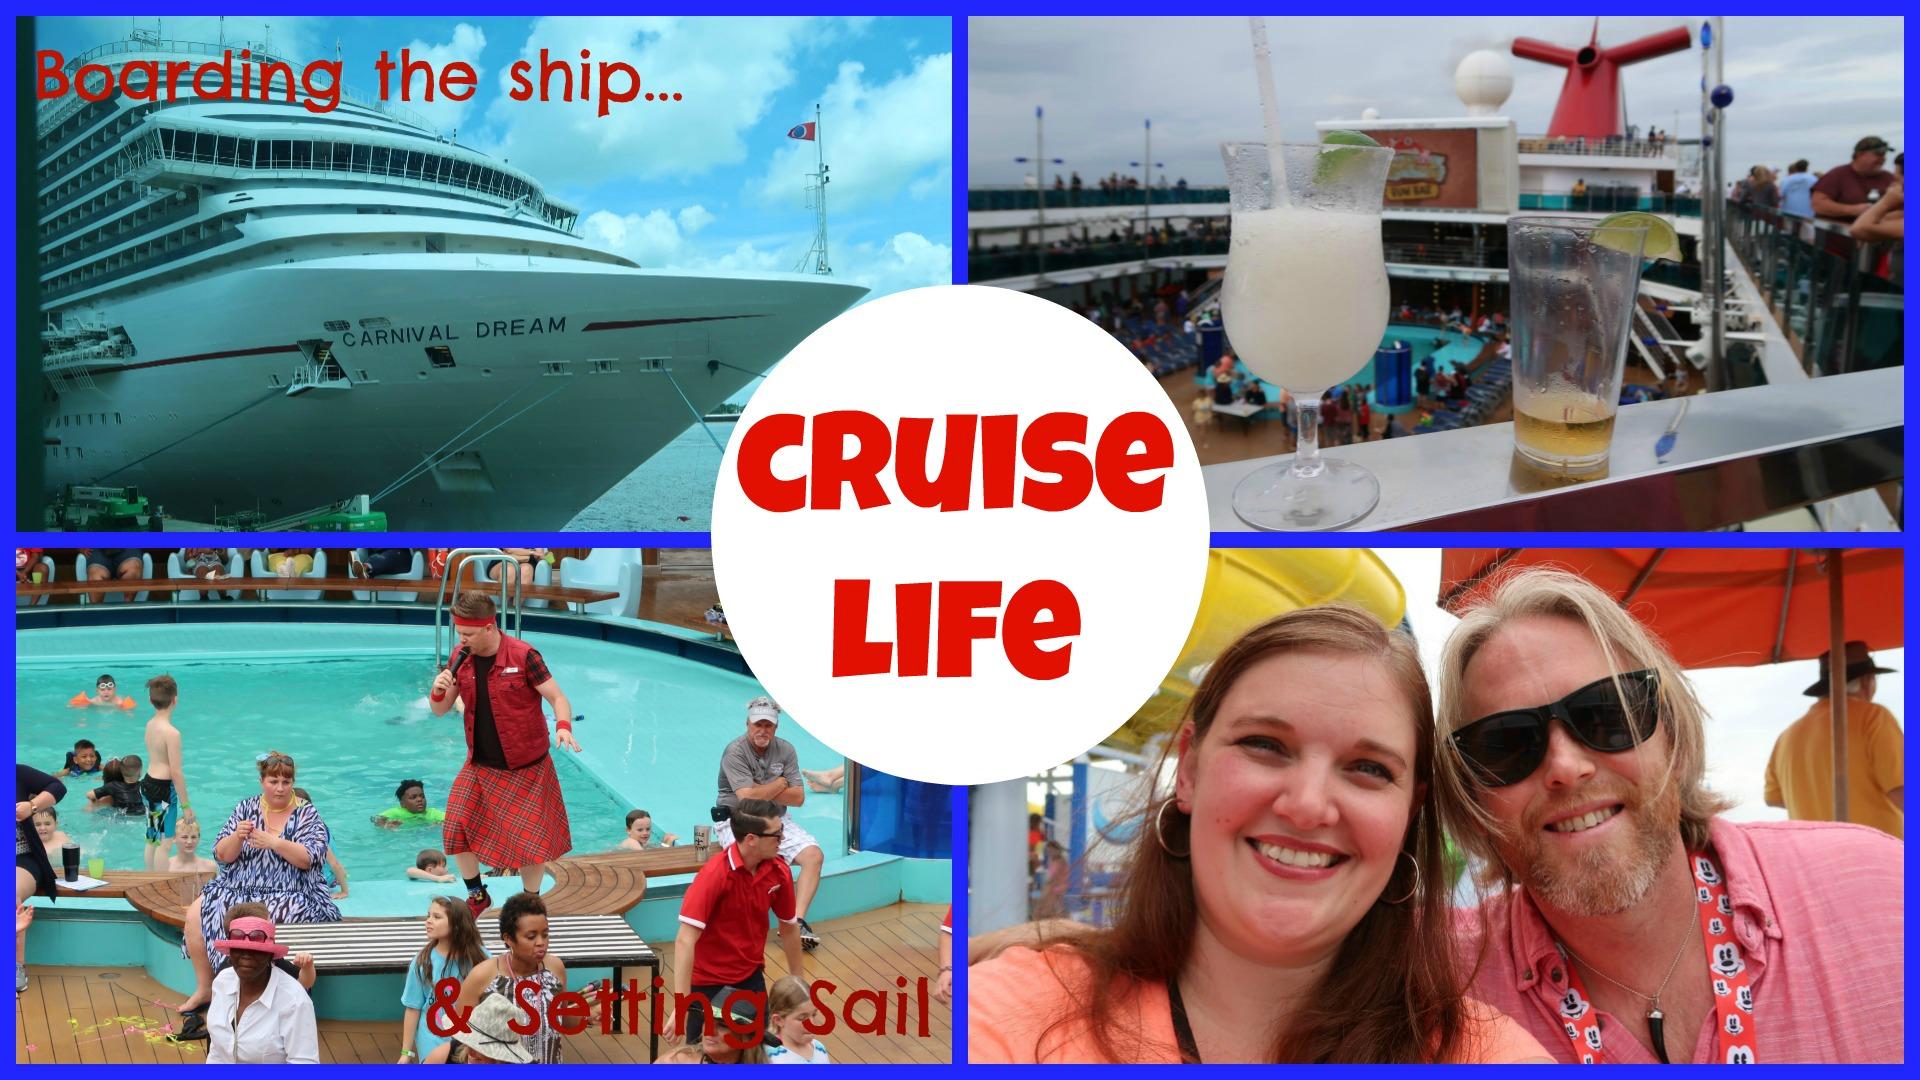 CRUISE LIFE: Boarding The Ship & Setting Sail